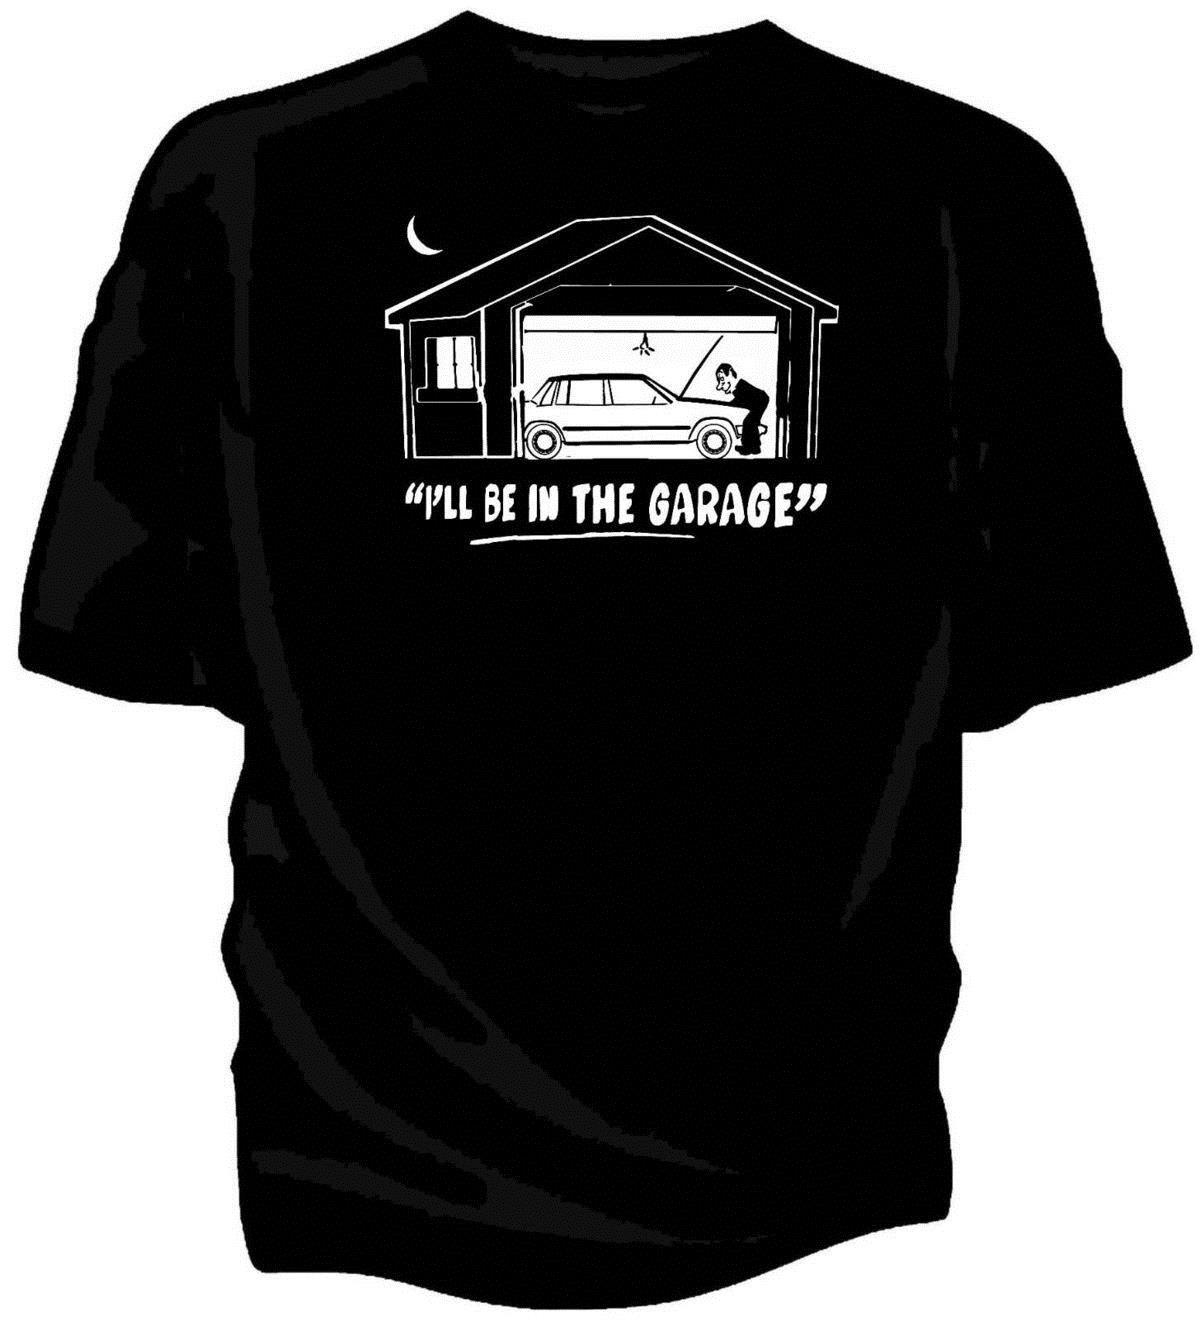 I Ll Be In The Garage Classic Car T Shirt Volvo 740 T Shirts Man